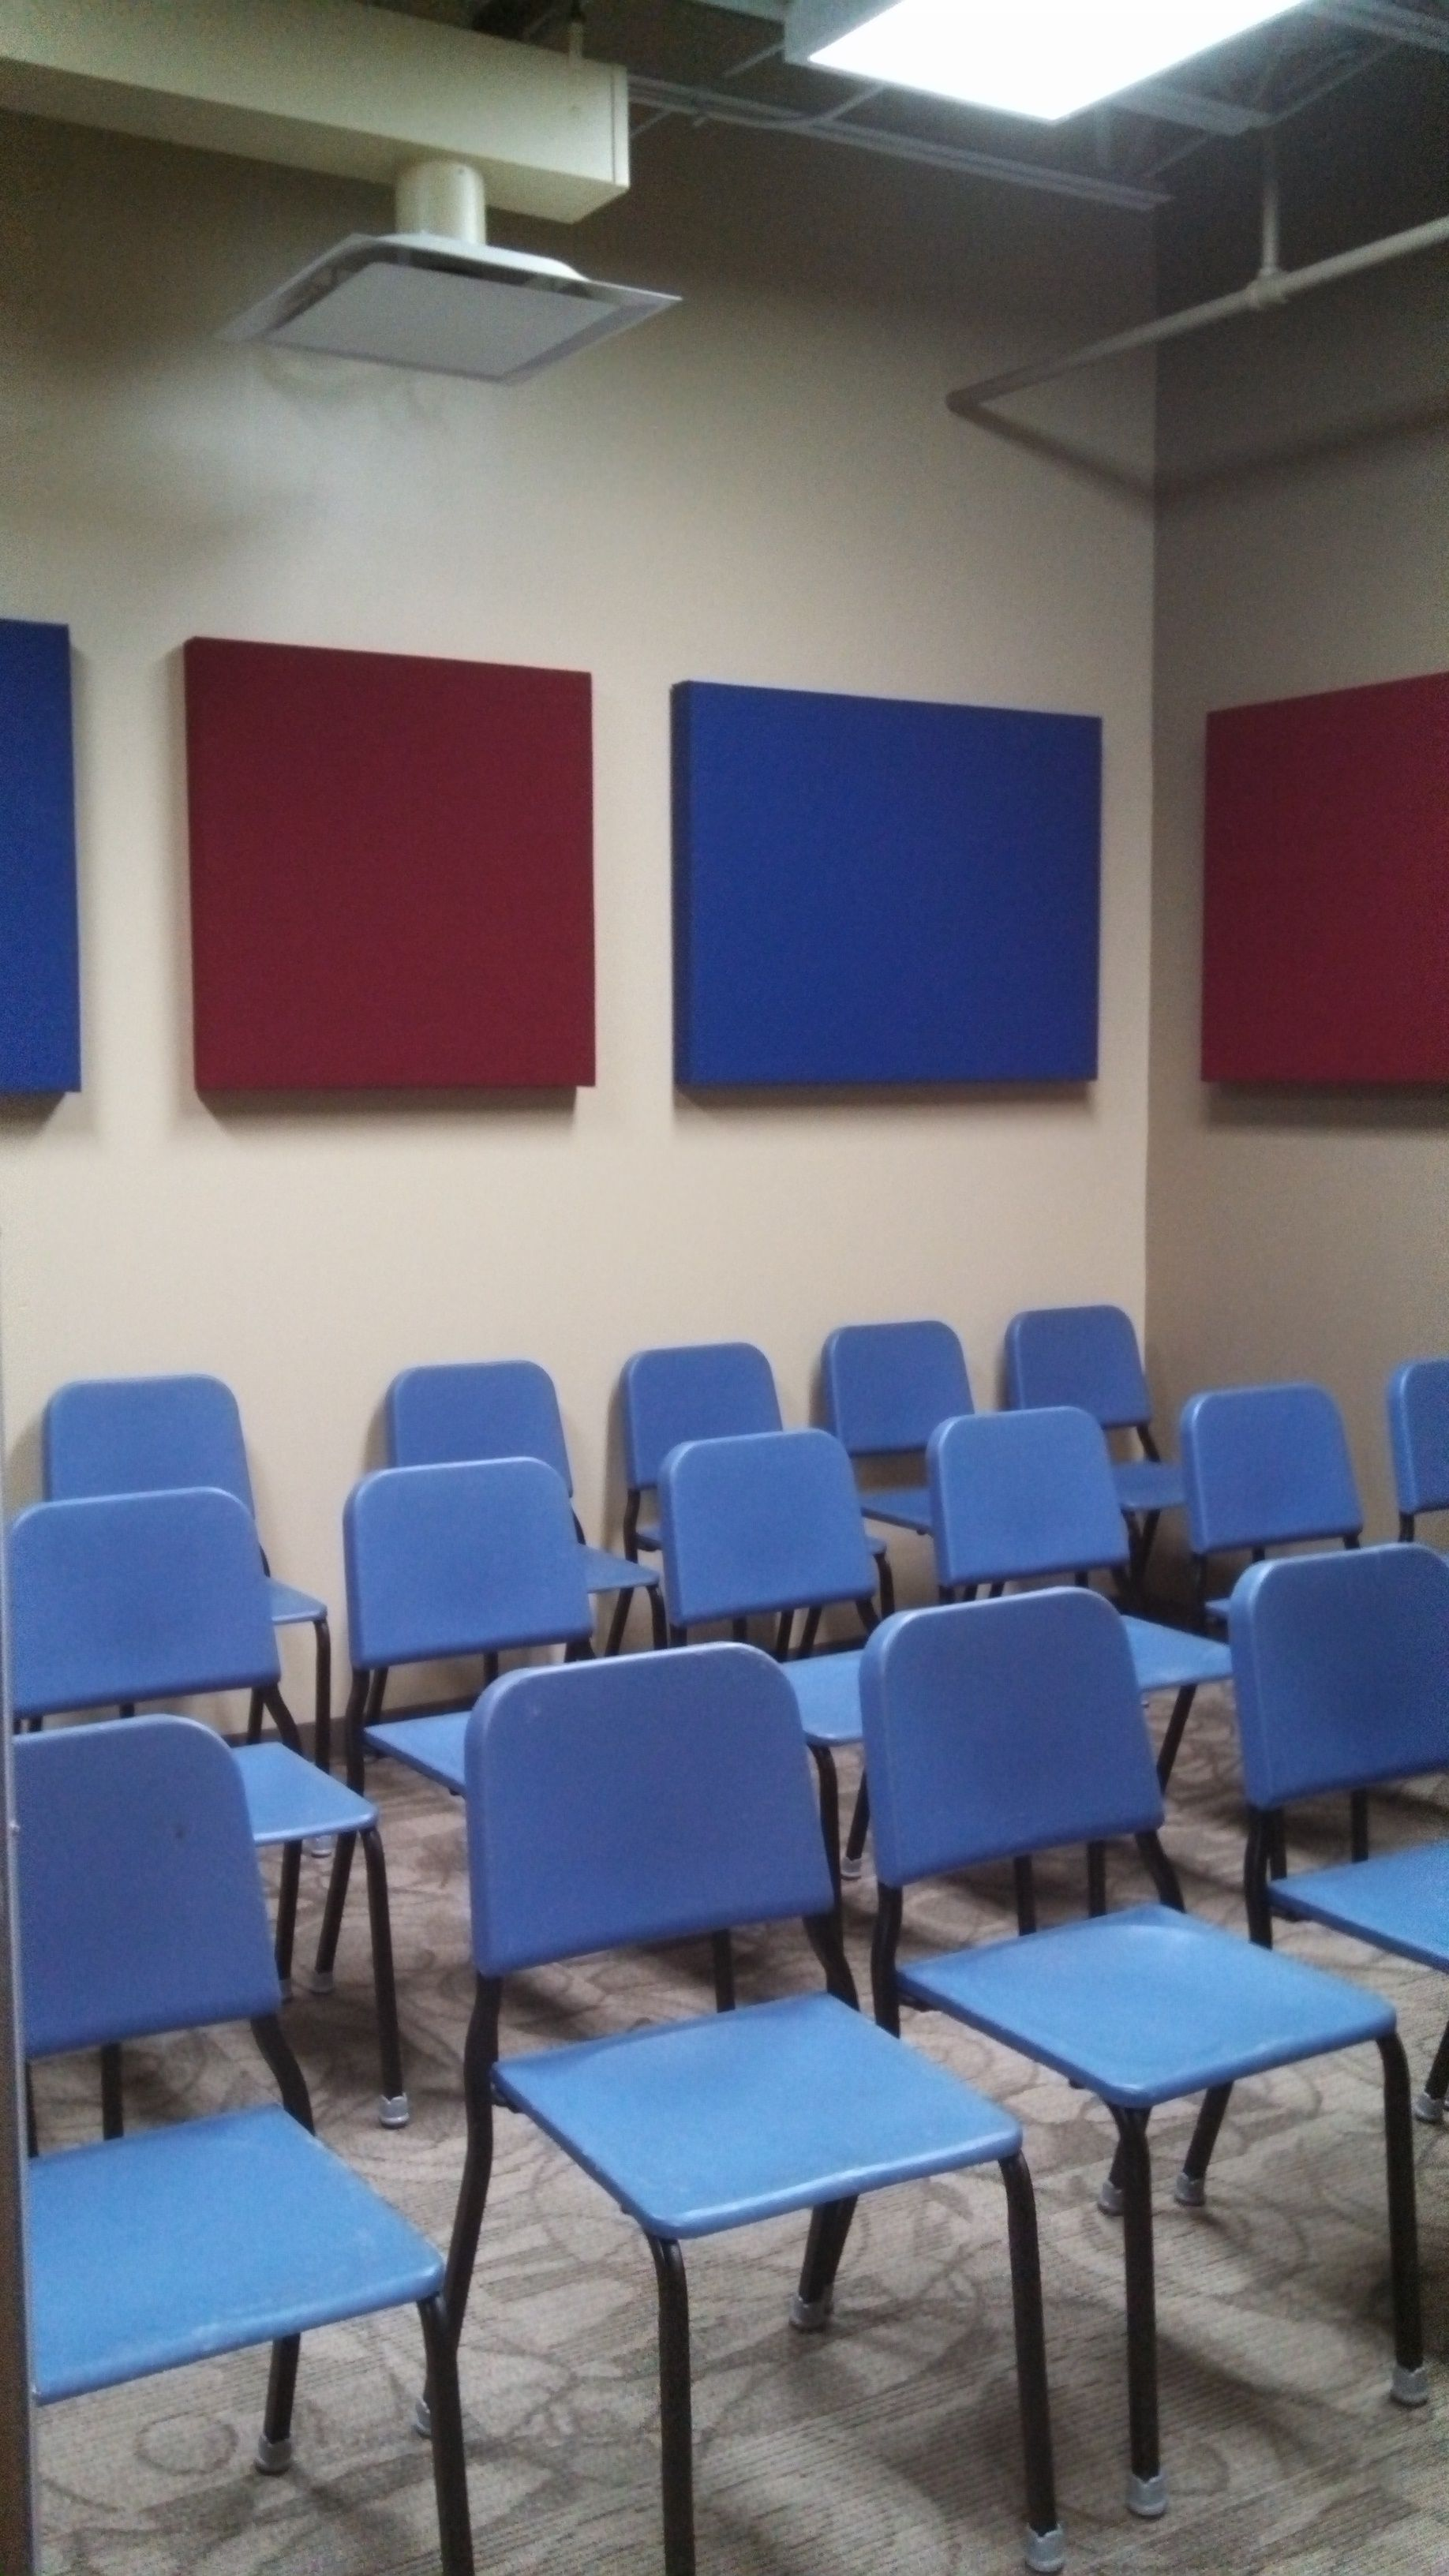 Decorah Band Practice Room Band Rooms Studio Room Room